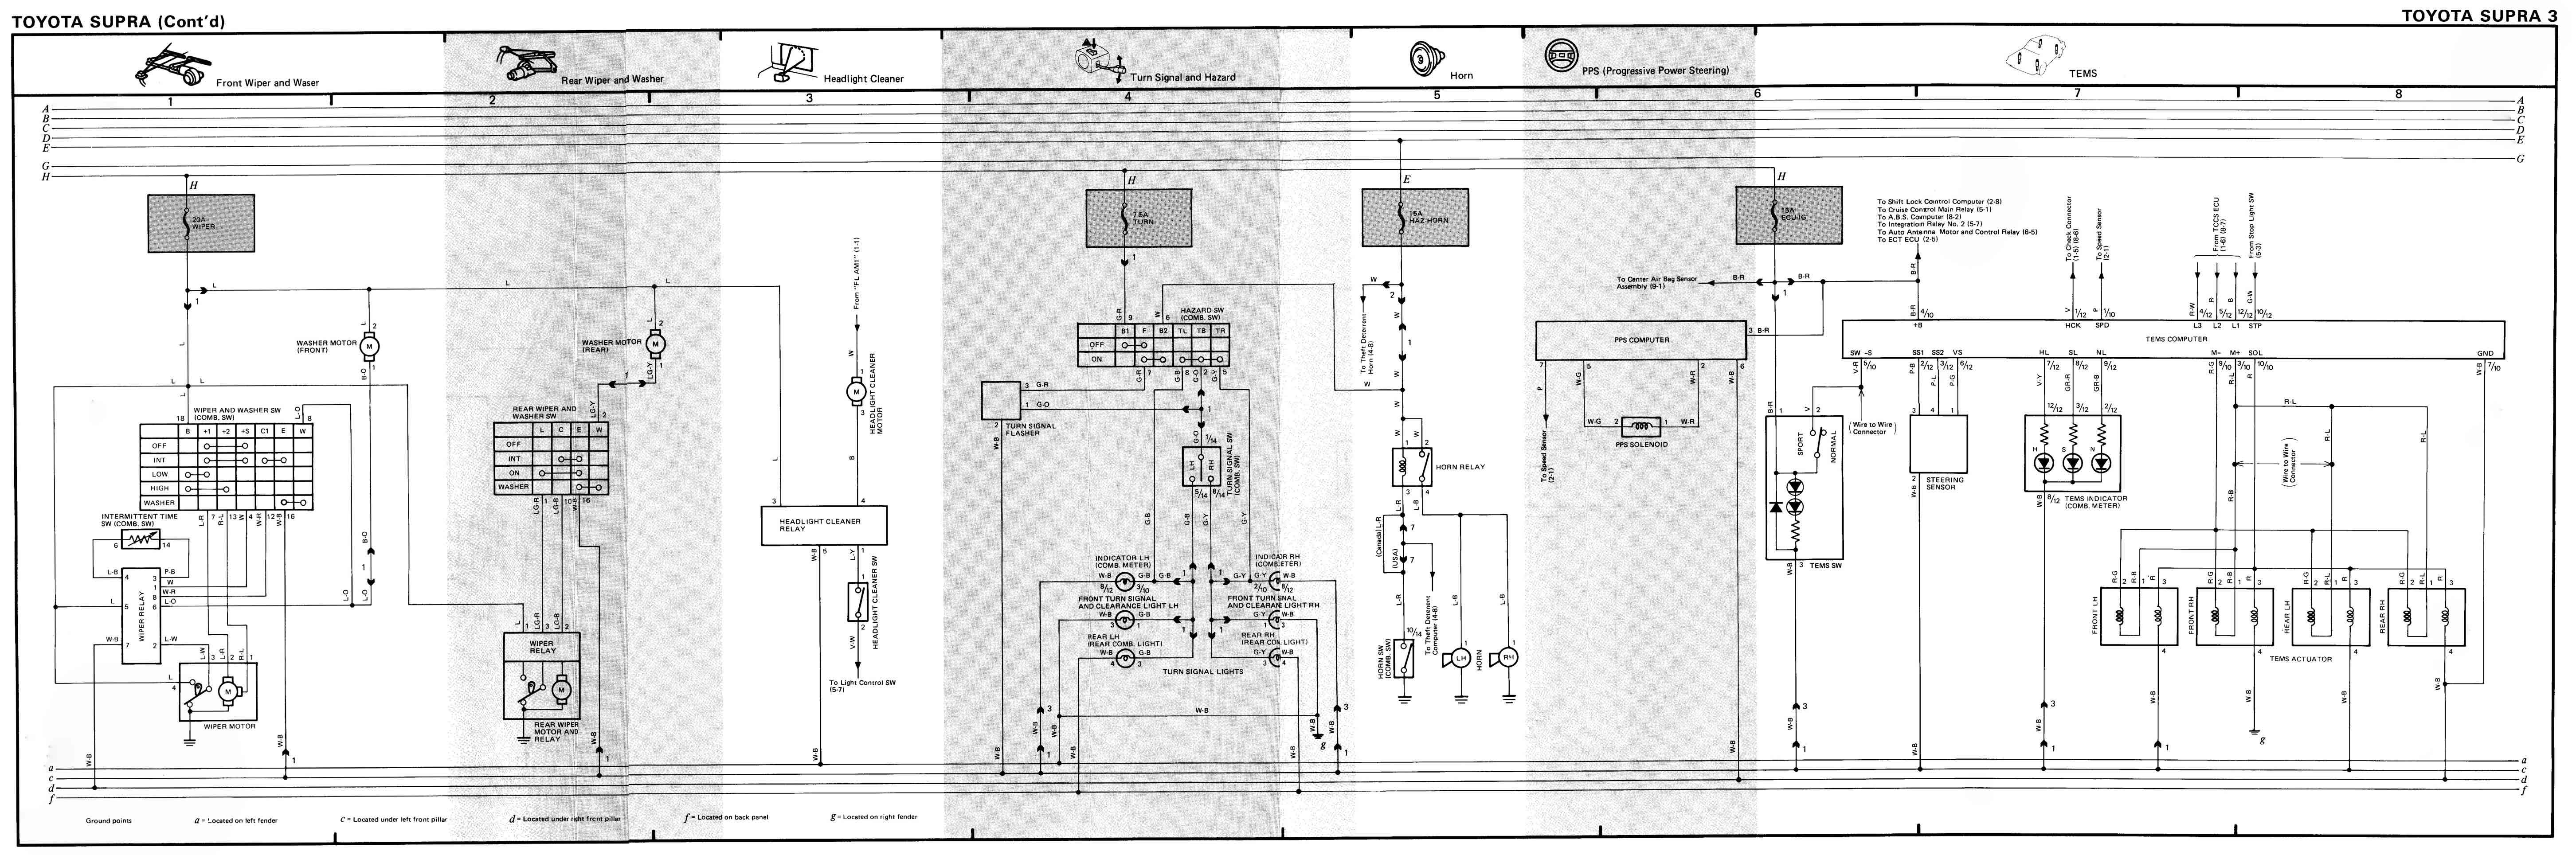 7mgte Wiring Harness Diagram Wiring Diagrams Mashups Co